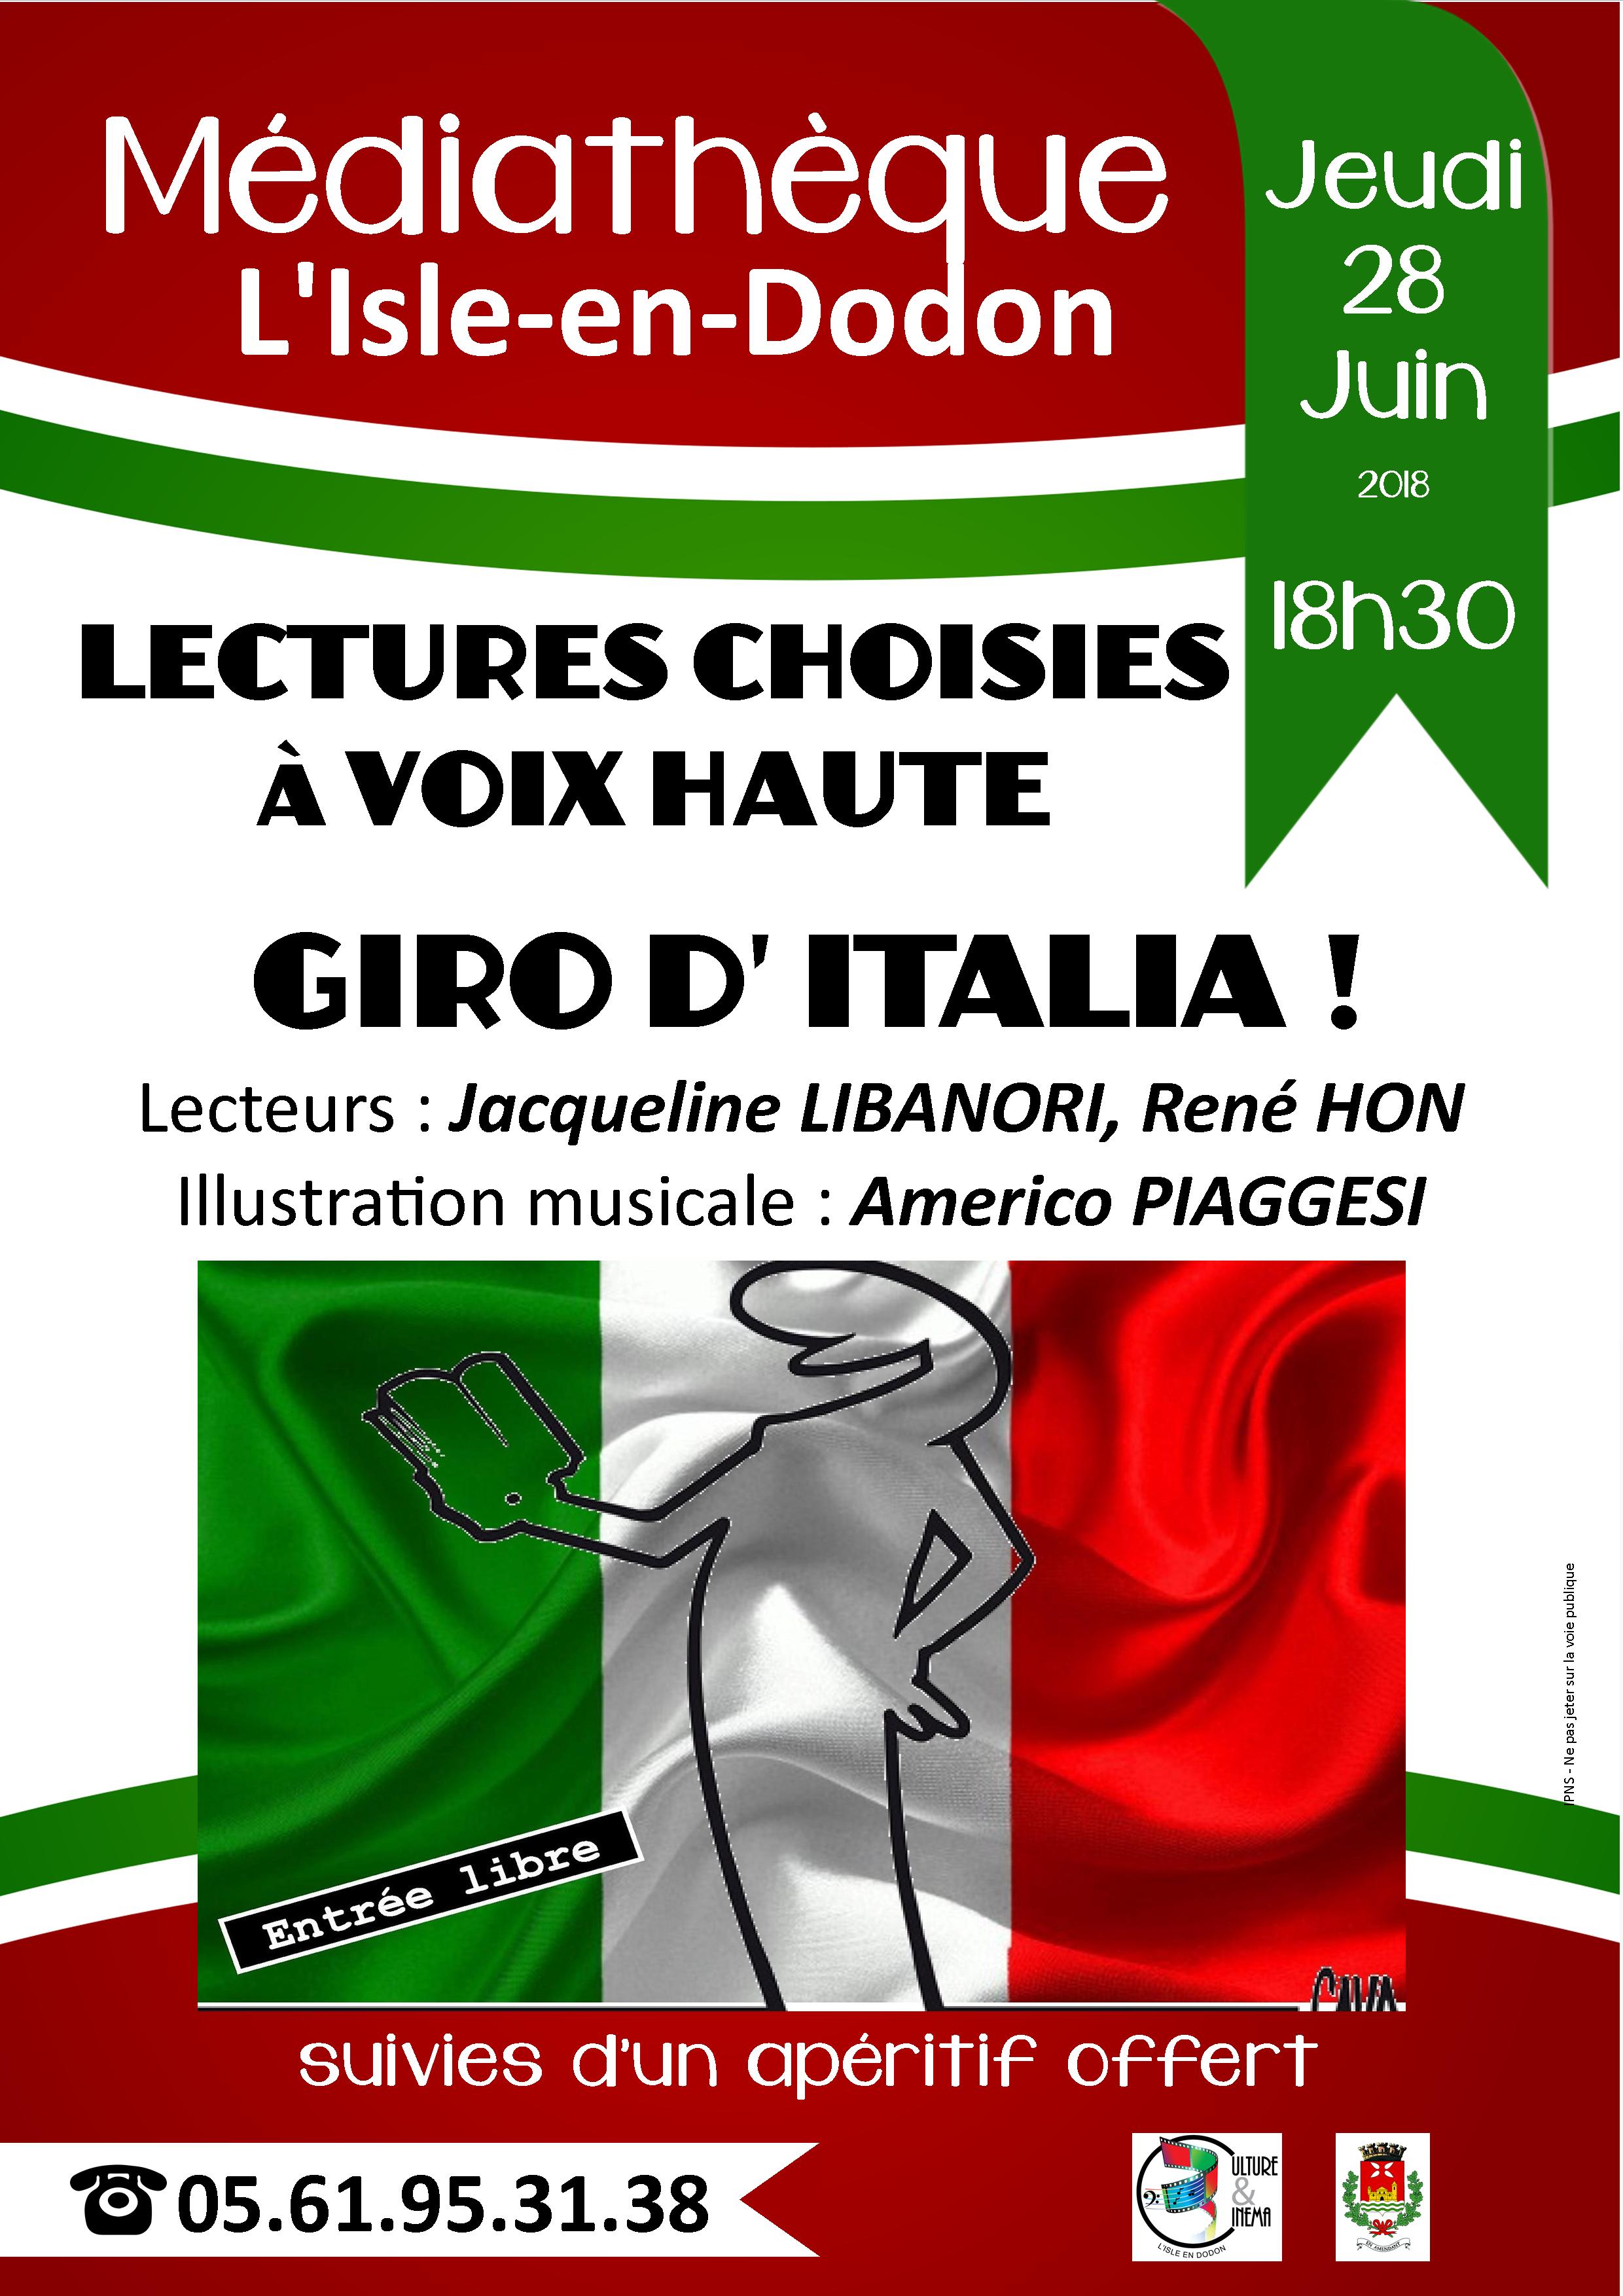 Giro d'Italia à la médiathèque de L'Isle-en-Dodon